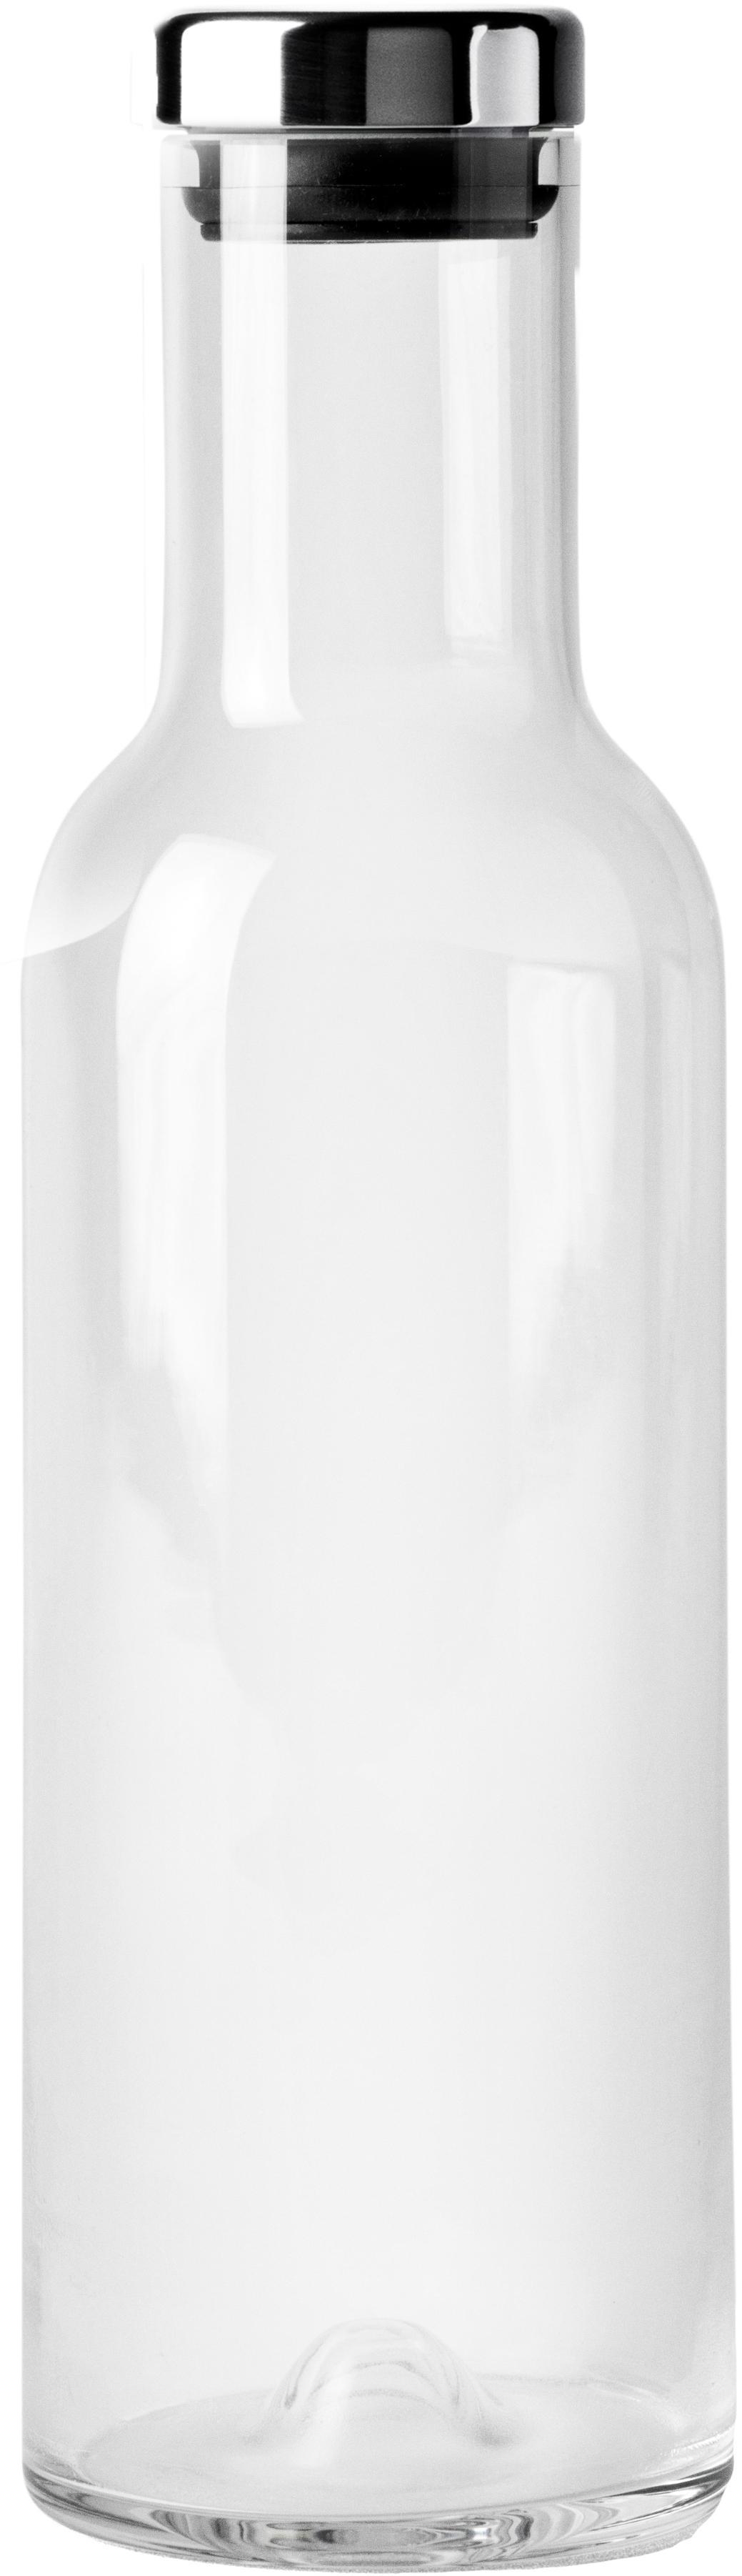 Karaffe Deluxe in Transparent mit silbernem Deckel, Glas mundgeblasen, Silikon, Transparent, 1 L